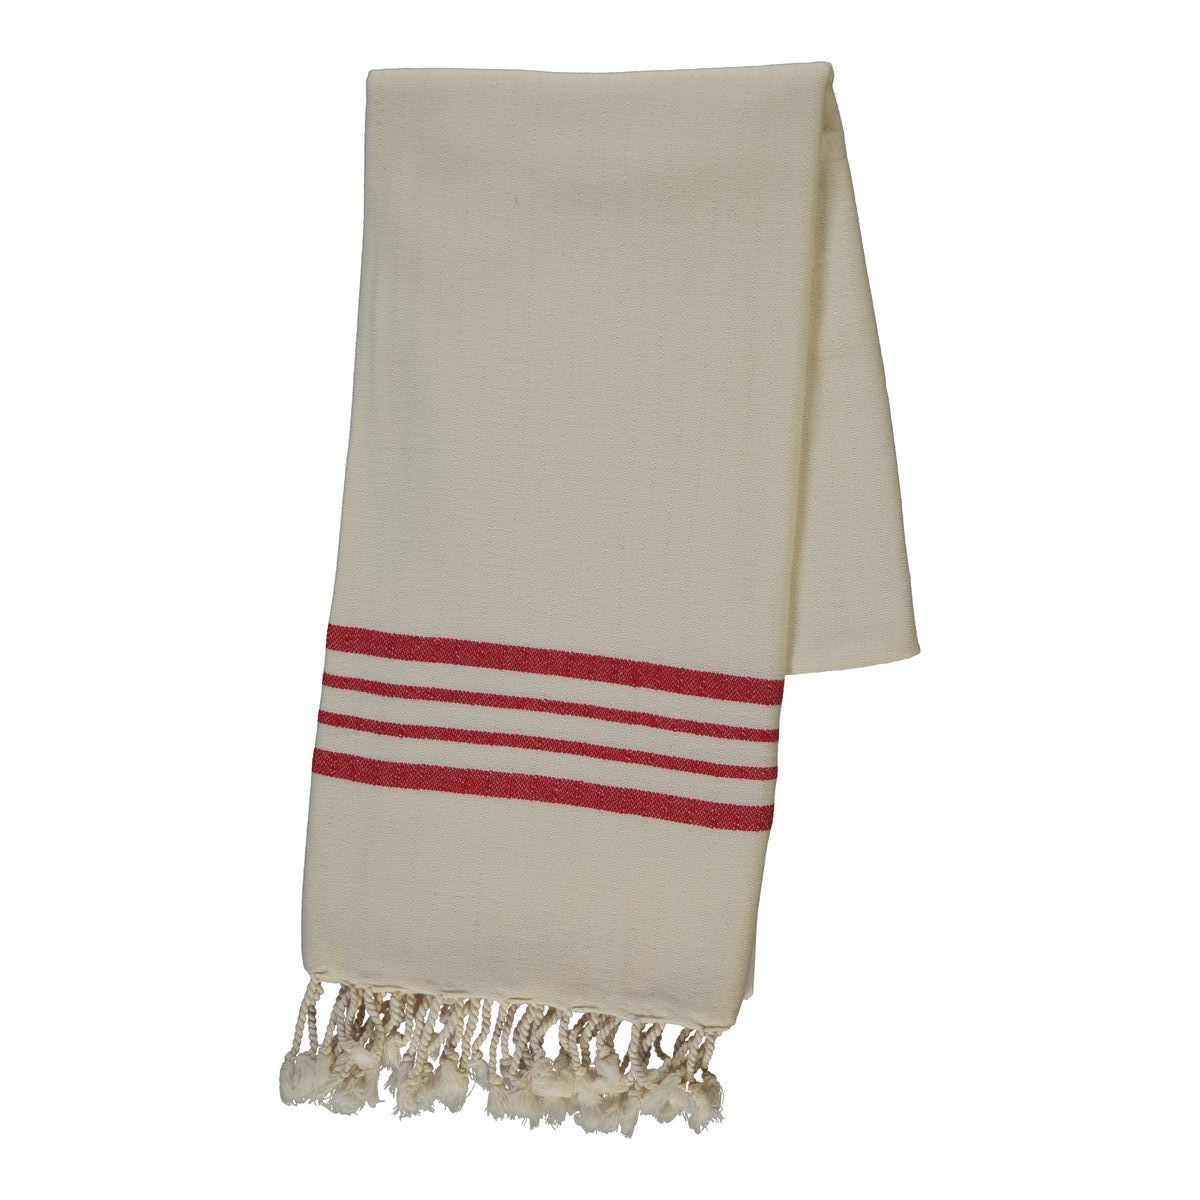 Peshtemal Sultan - Red Stripes